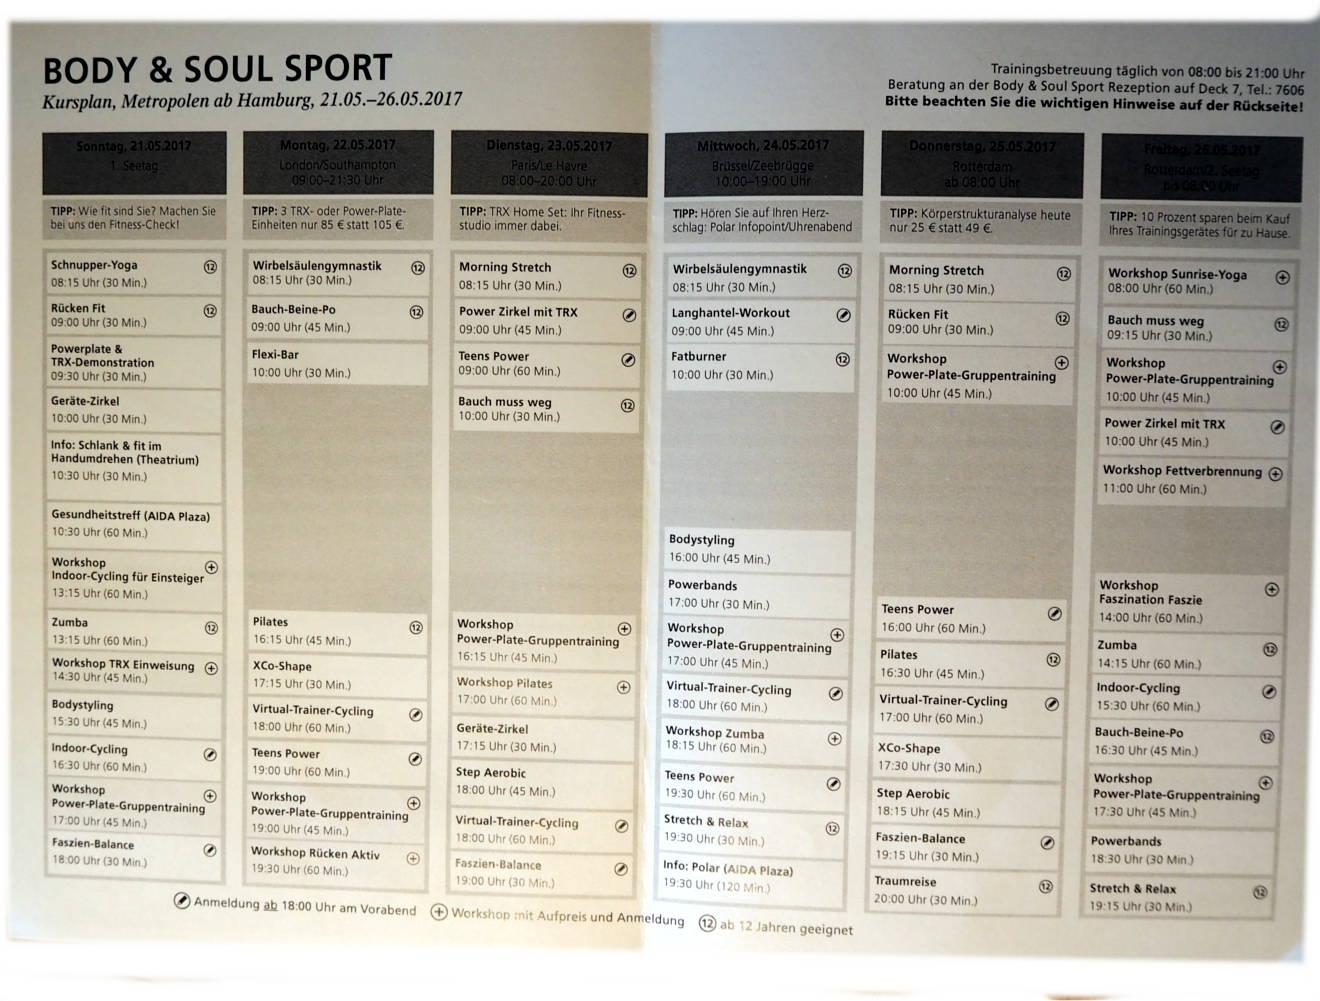 AIDAprima Body & Soul Sport Kursplan Zeiten